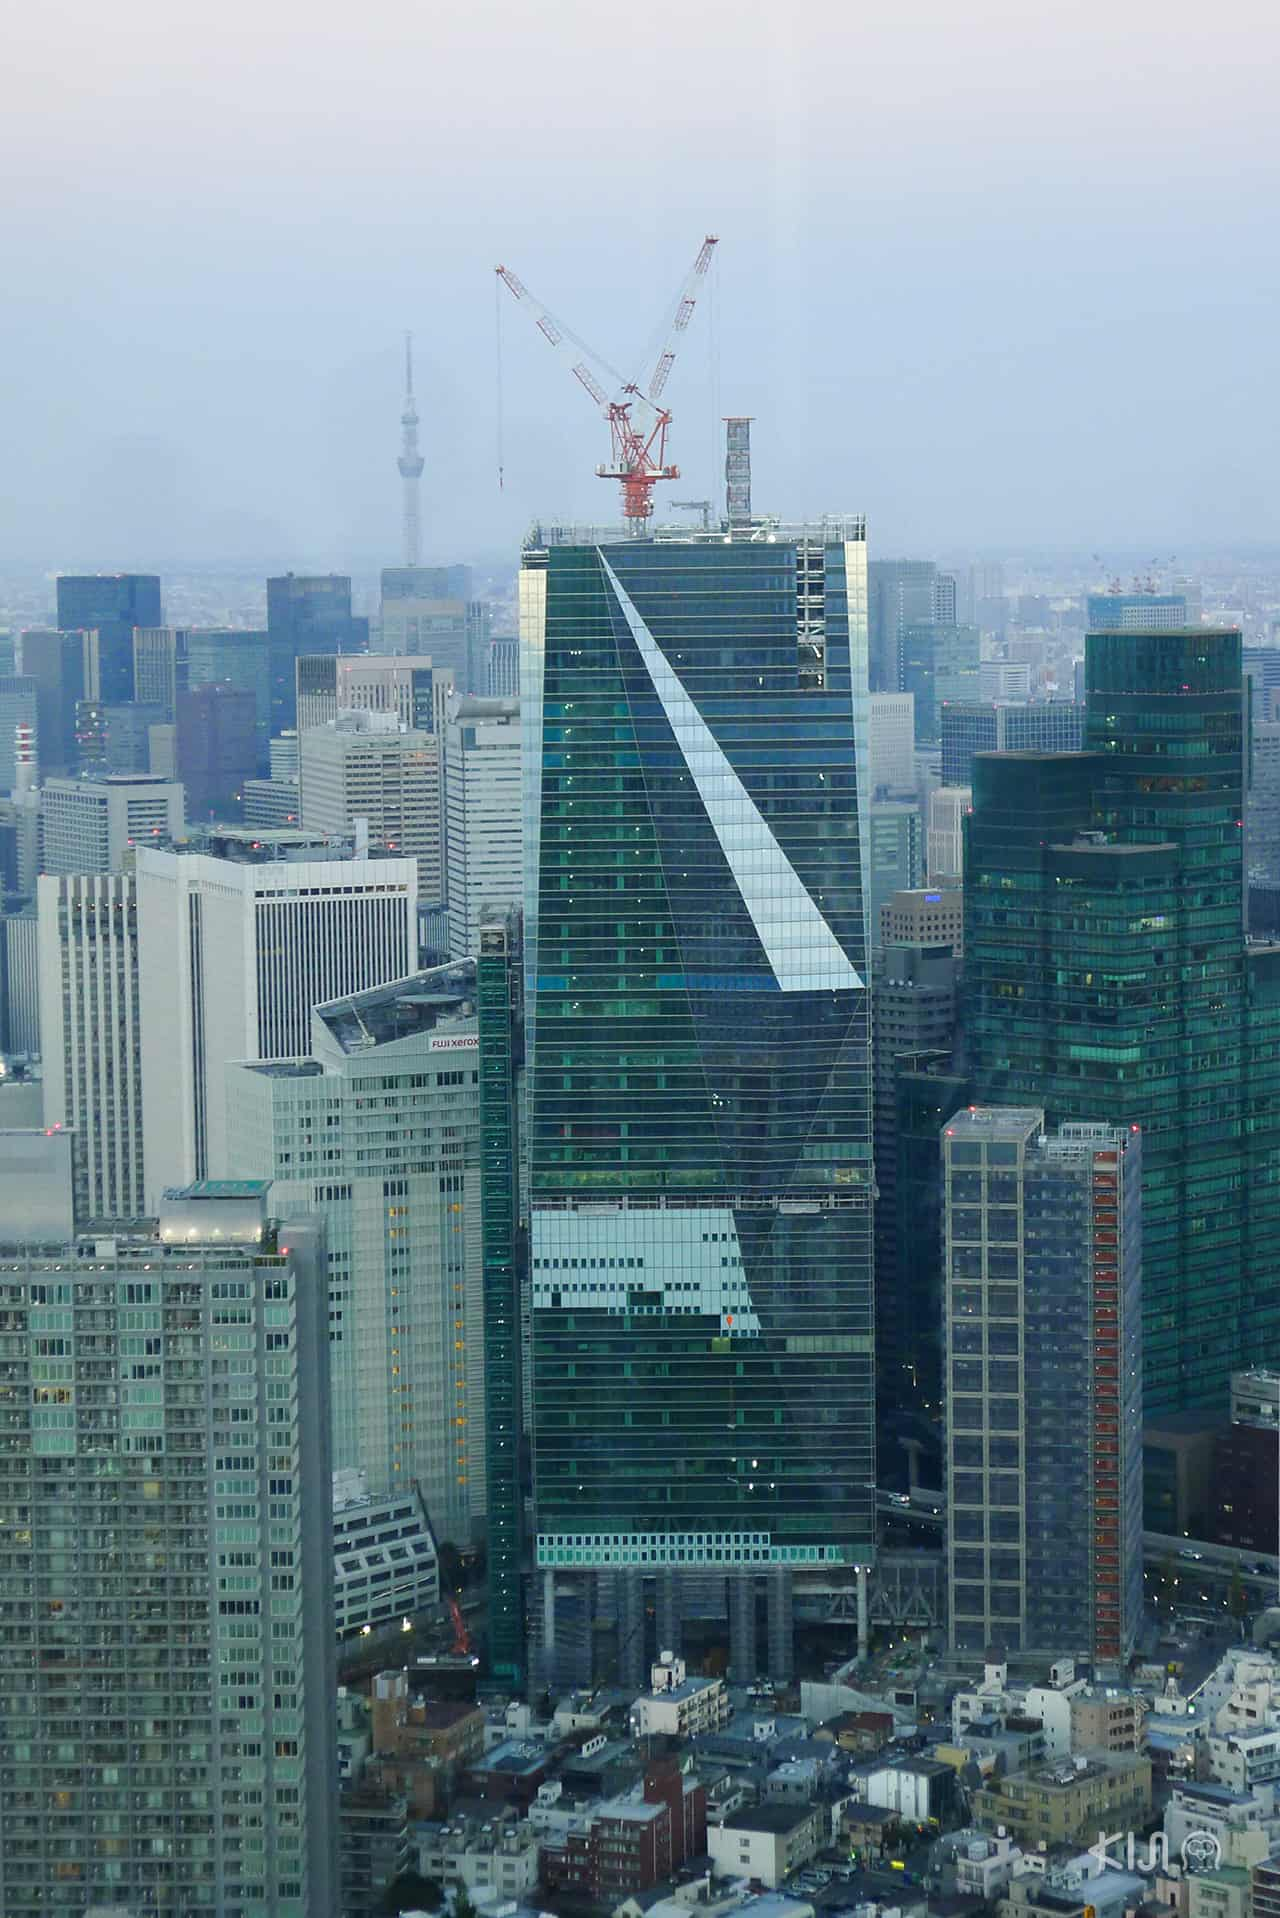 Sumitomo Fudosan Roppongi Grand Tower